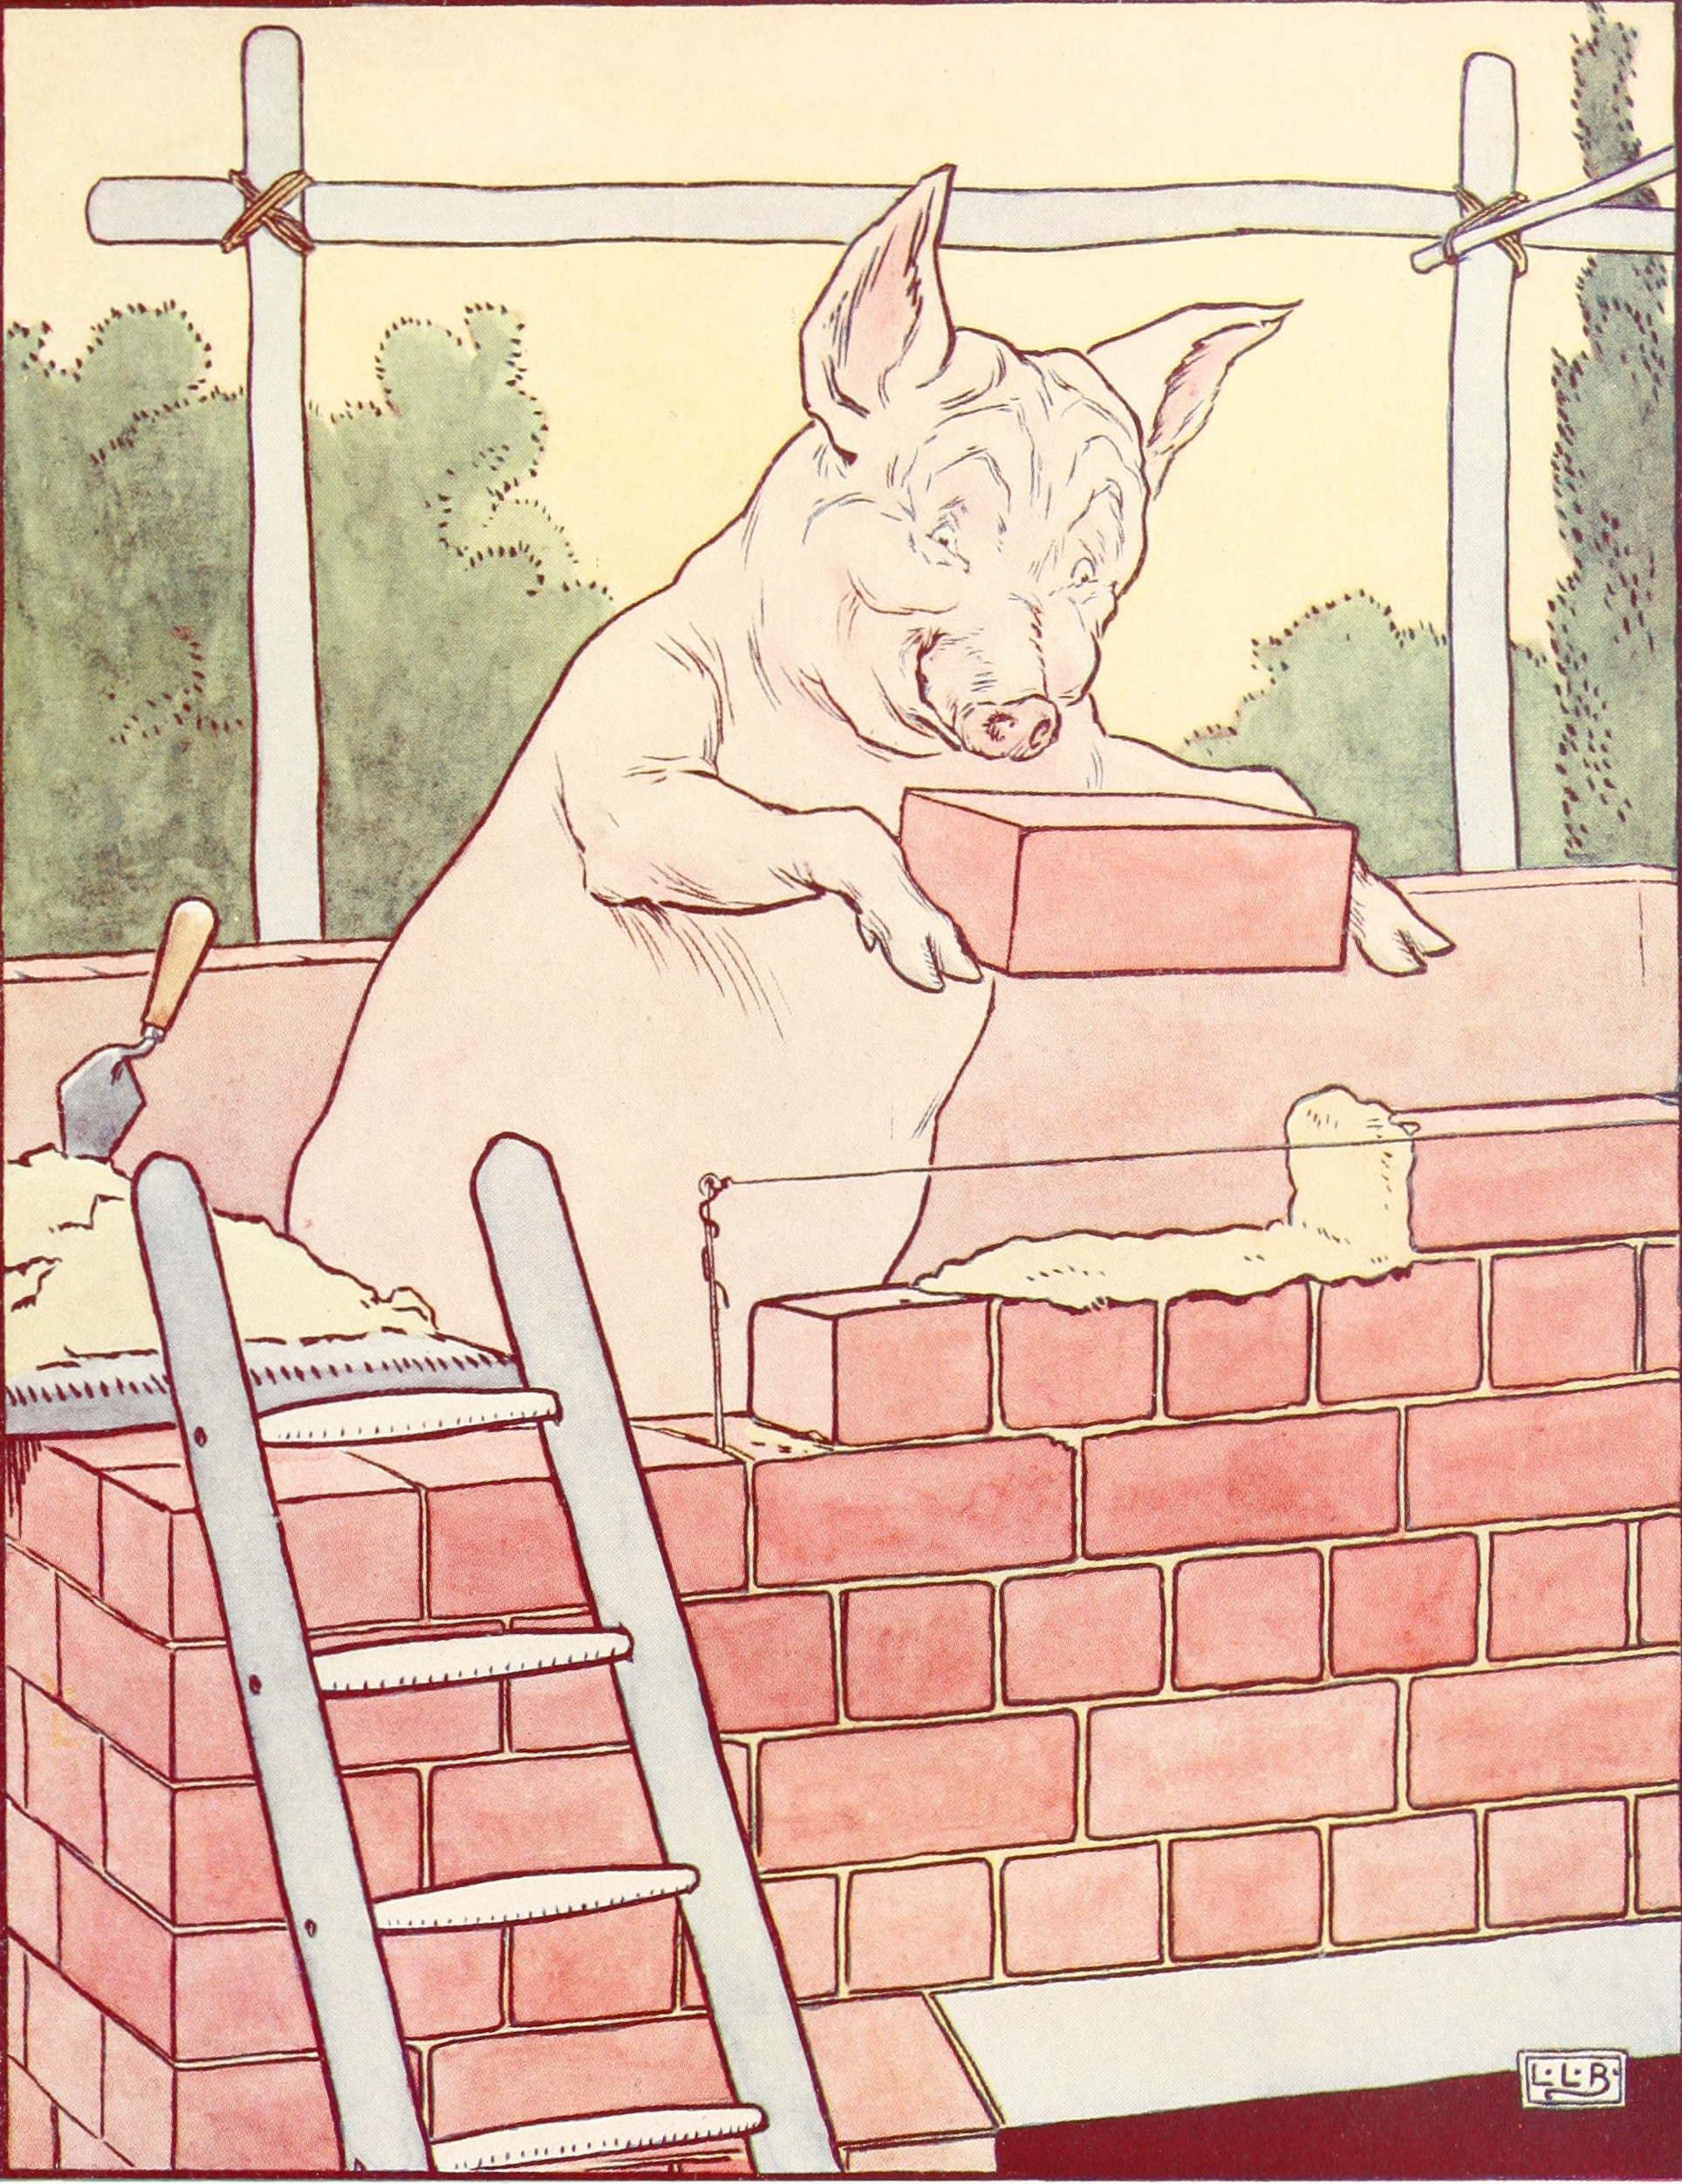 Dessin Animé Trois Petit Cochon : dessin, animé, trois, petit, cochon, Trois, Petits, Cochons, Wikipédia